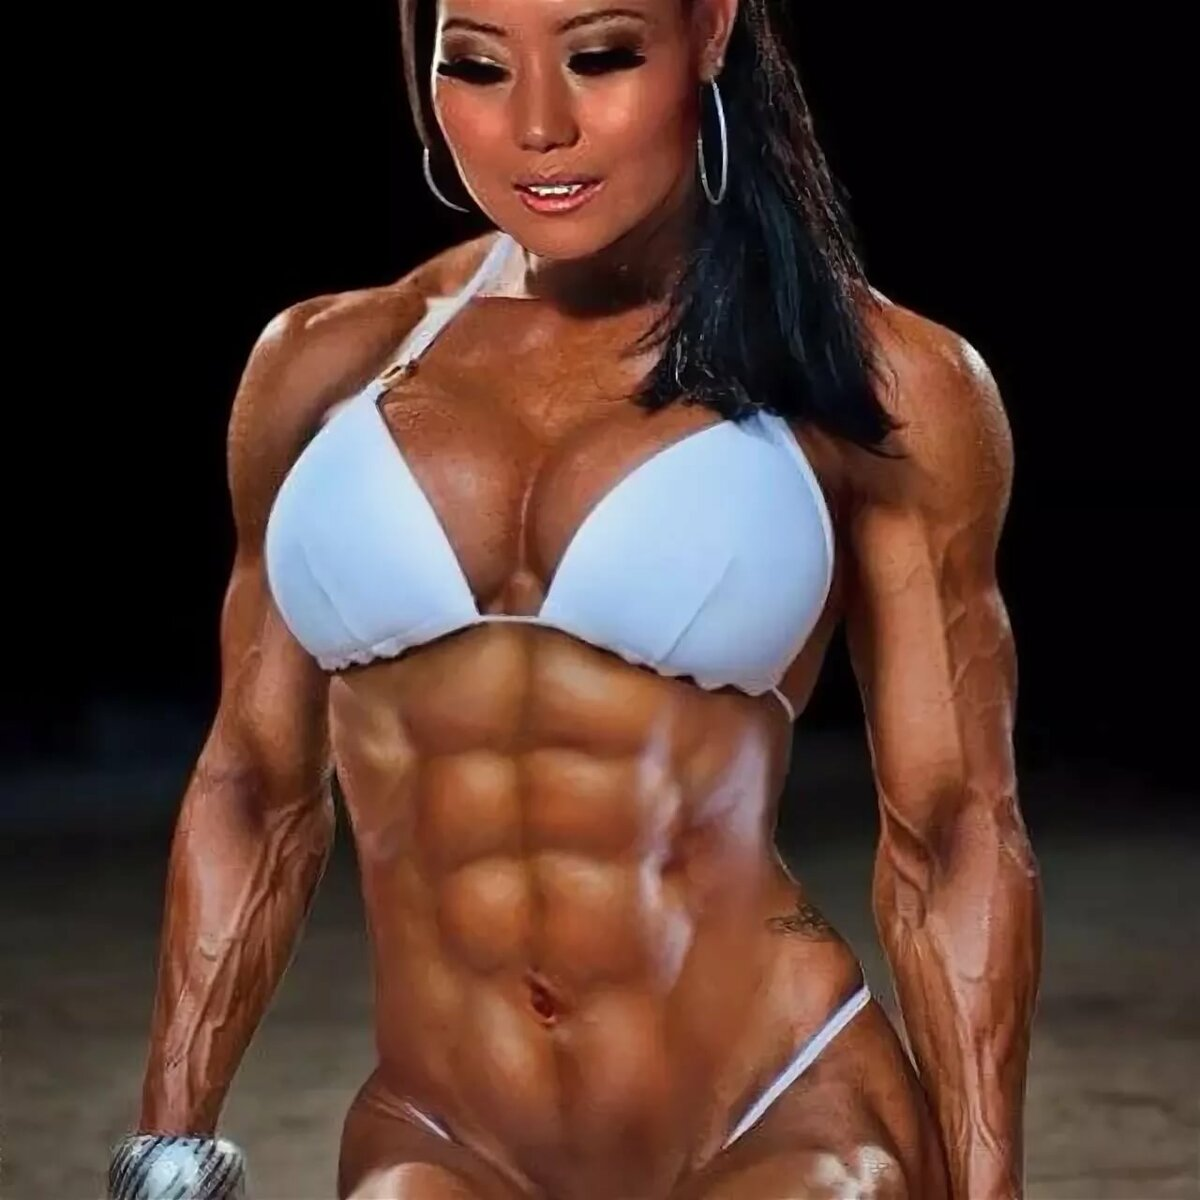 Woman with great body fucks porno